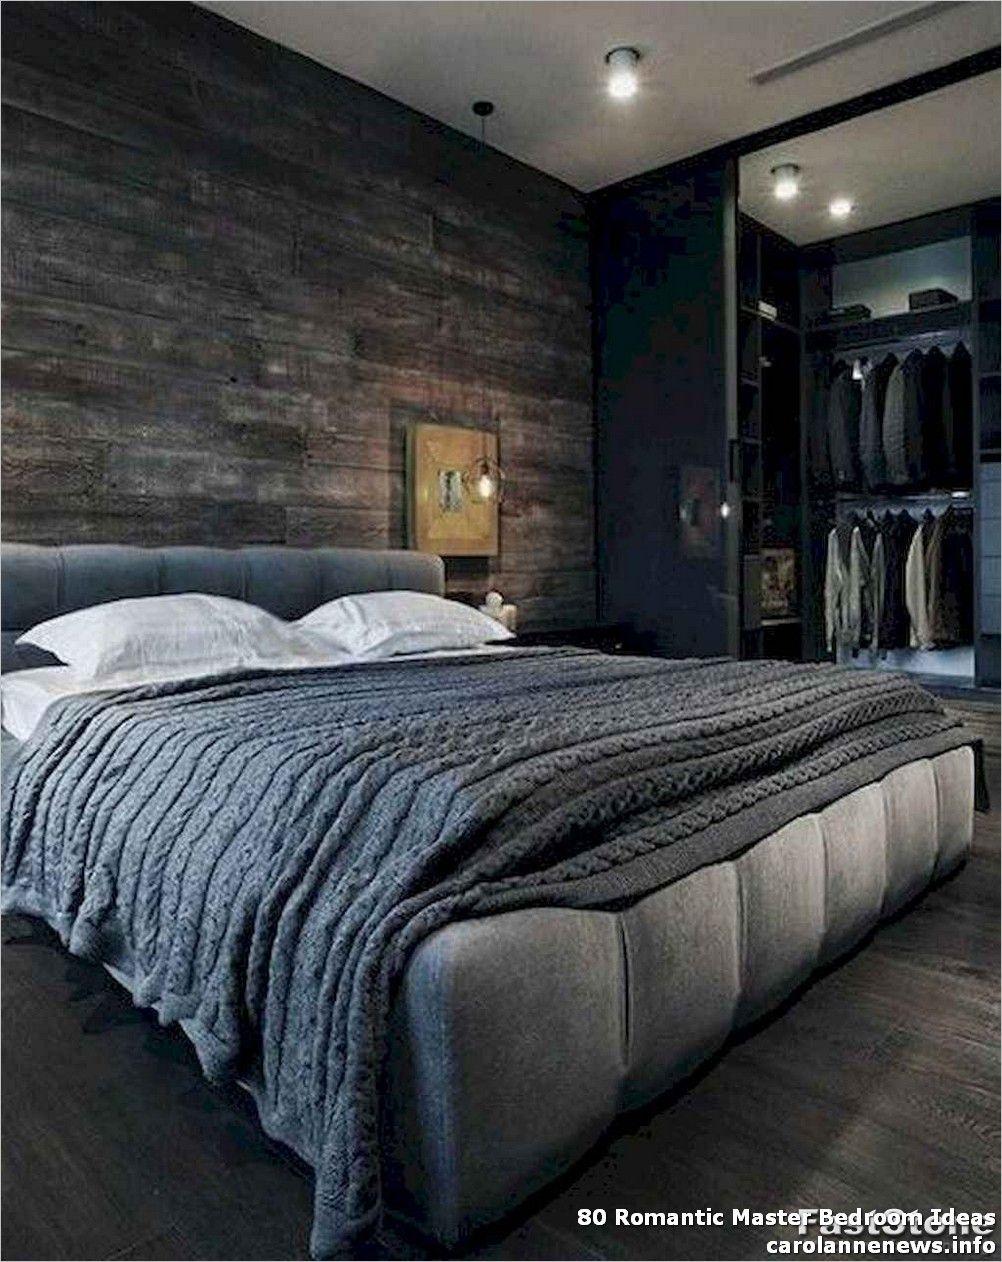 80 Romantic Master Bedroom Ideas - In actual fact, smaller ...